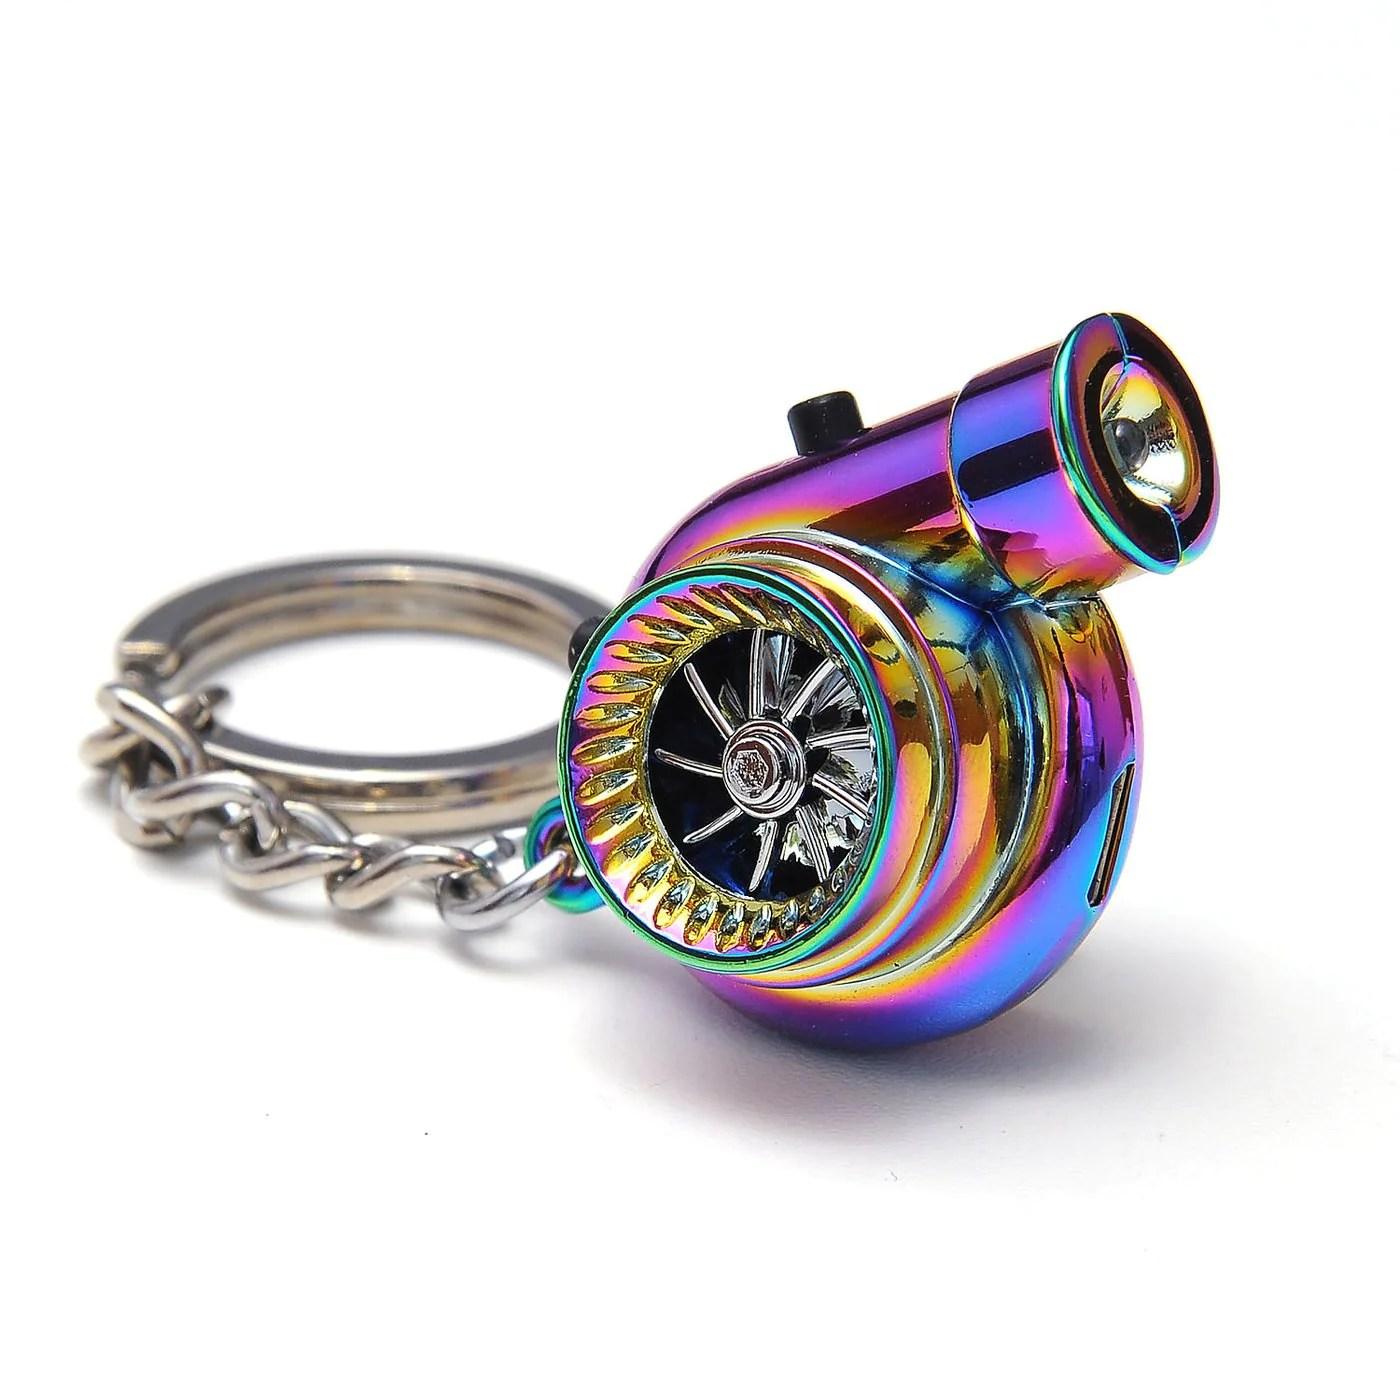 electronic spinning turbo keychain